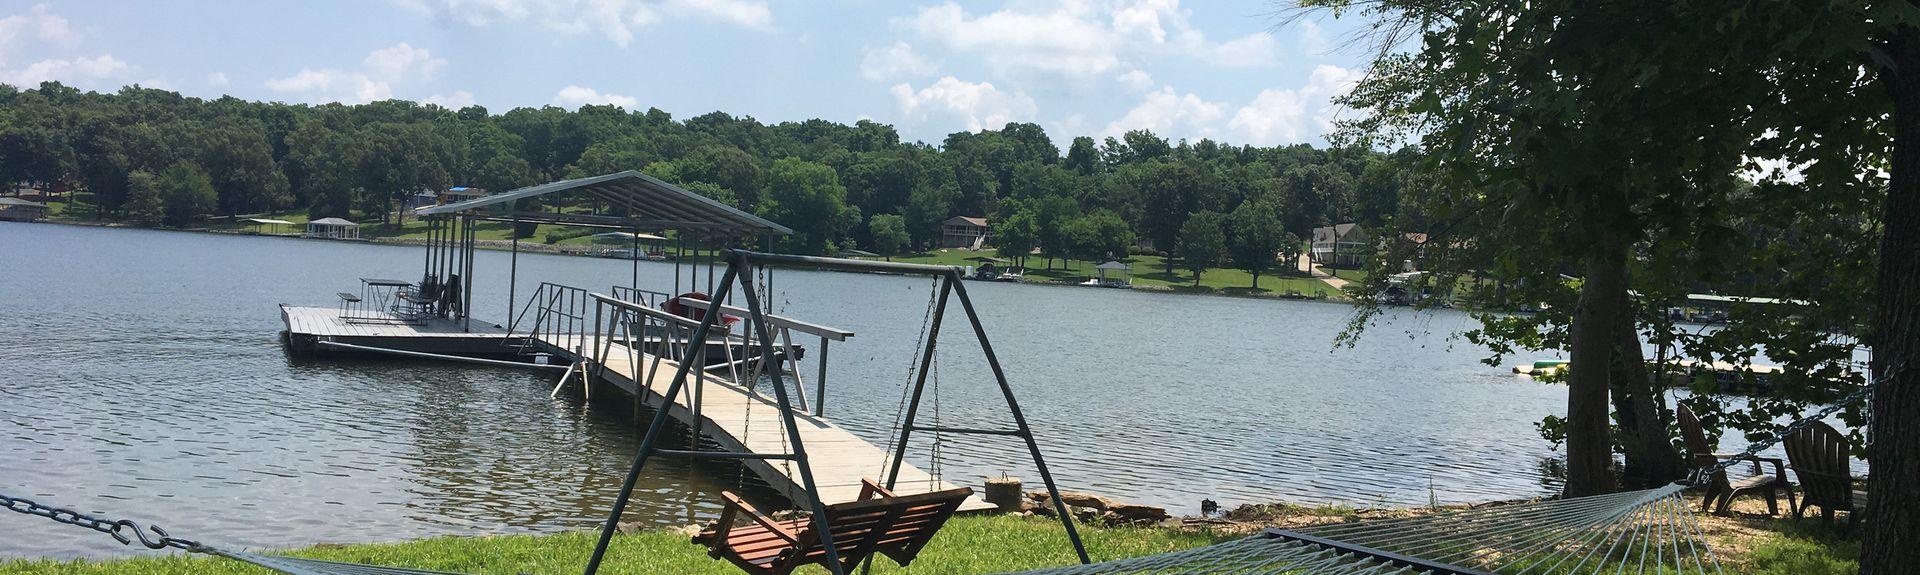 Kentucky Dam Marina, Gilbertsville, Kentucky, United States of America